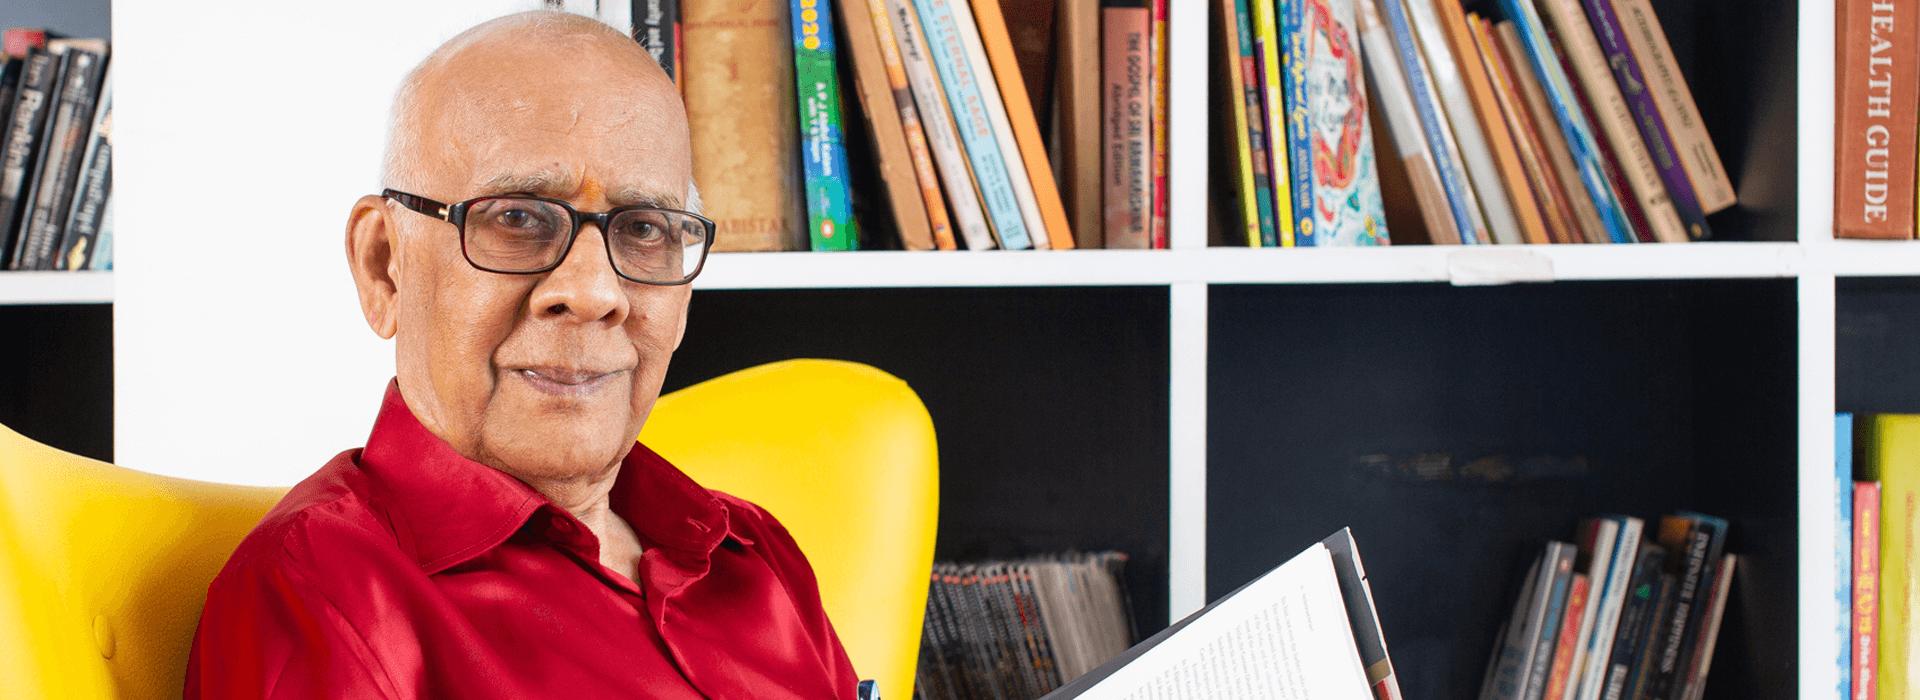 Dr. A Sreekumar Menon, a Serene Urbana resident, spending time in the library